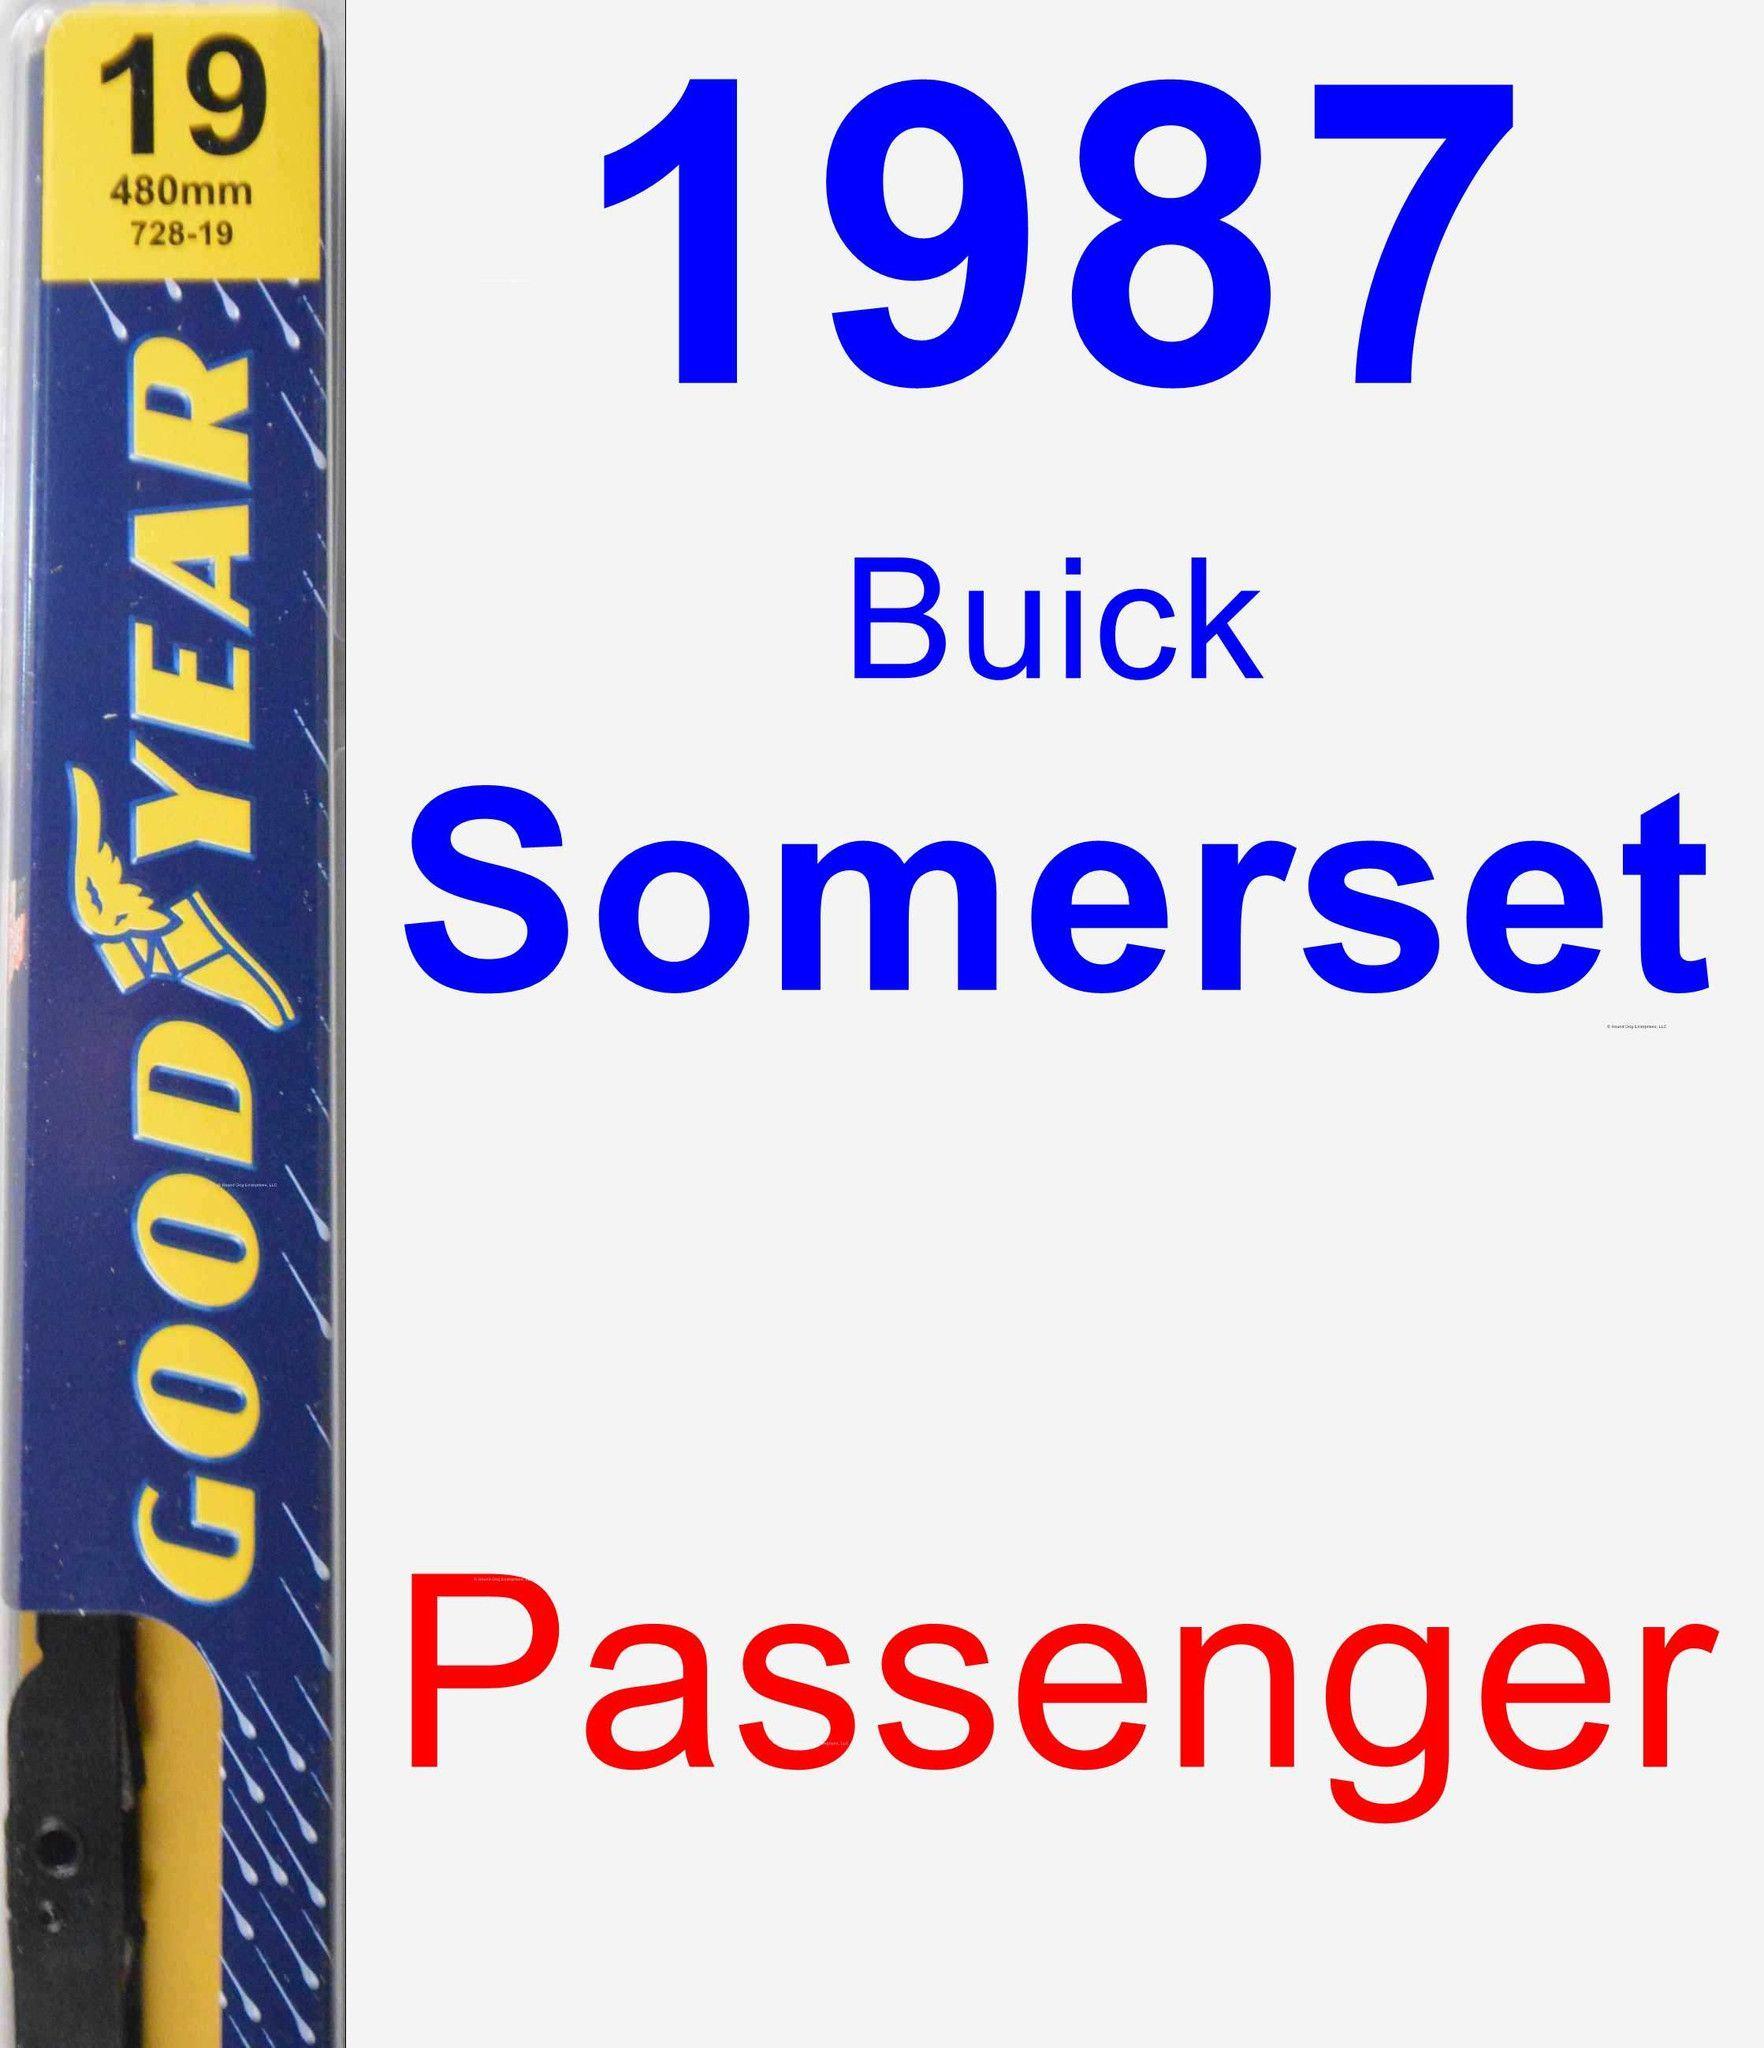 Passenger Wiper Blade for 1987 Buick Somerset - Premium